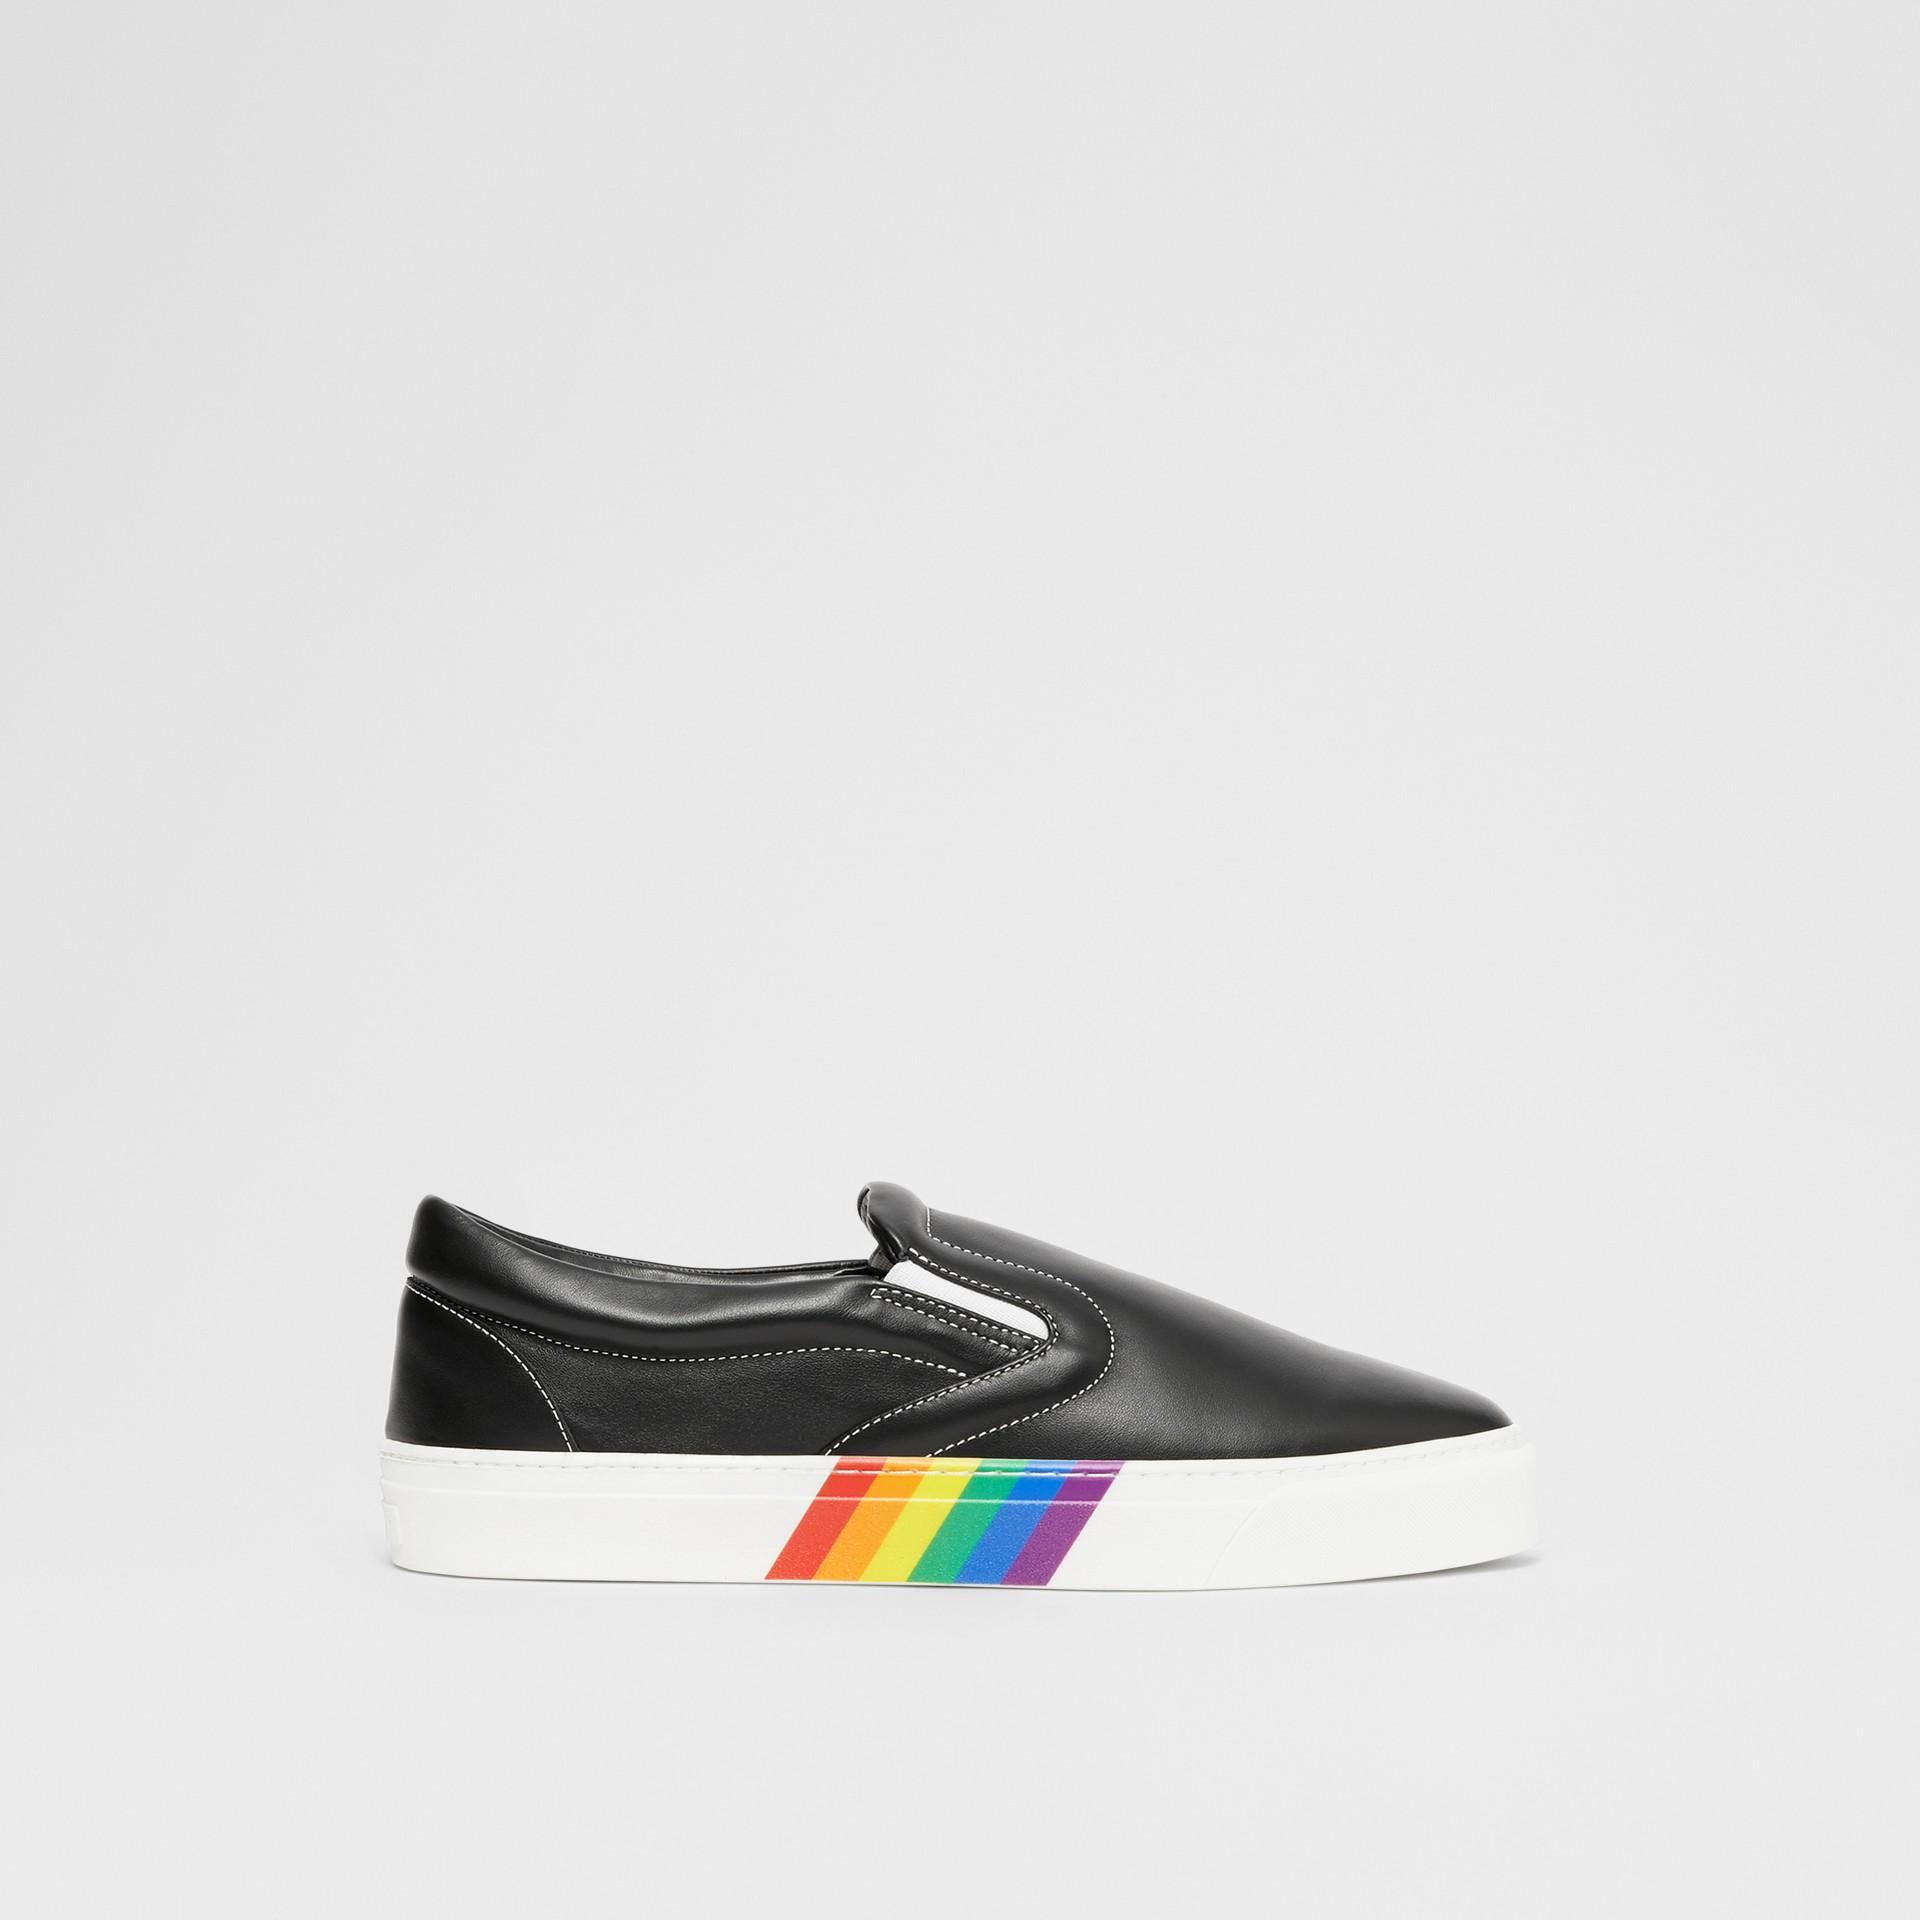 Rainbow Print Leather Slip-on Sneakers in Black - Women   Burberry United Kingdom - gallery image 5